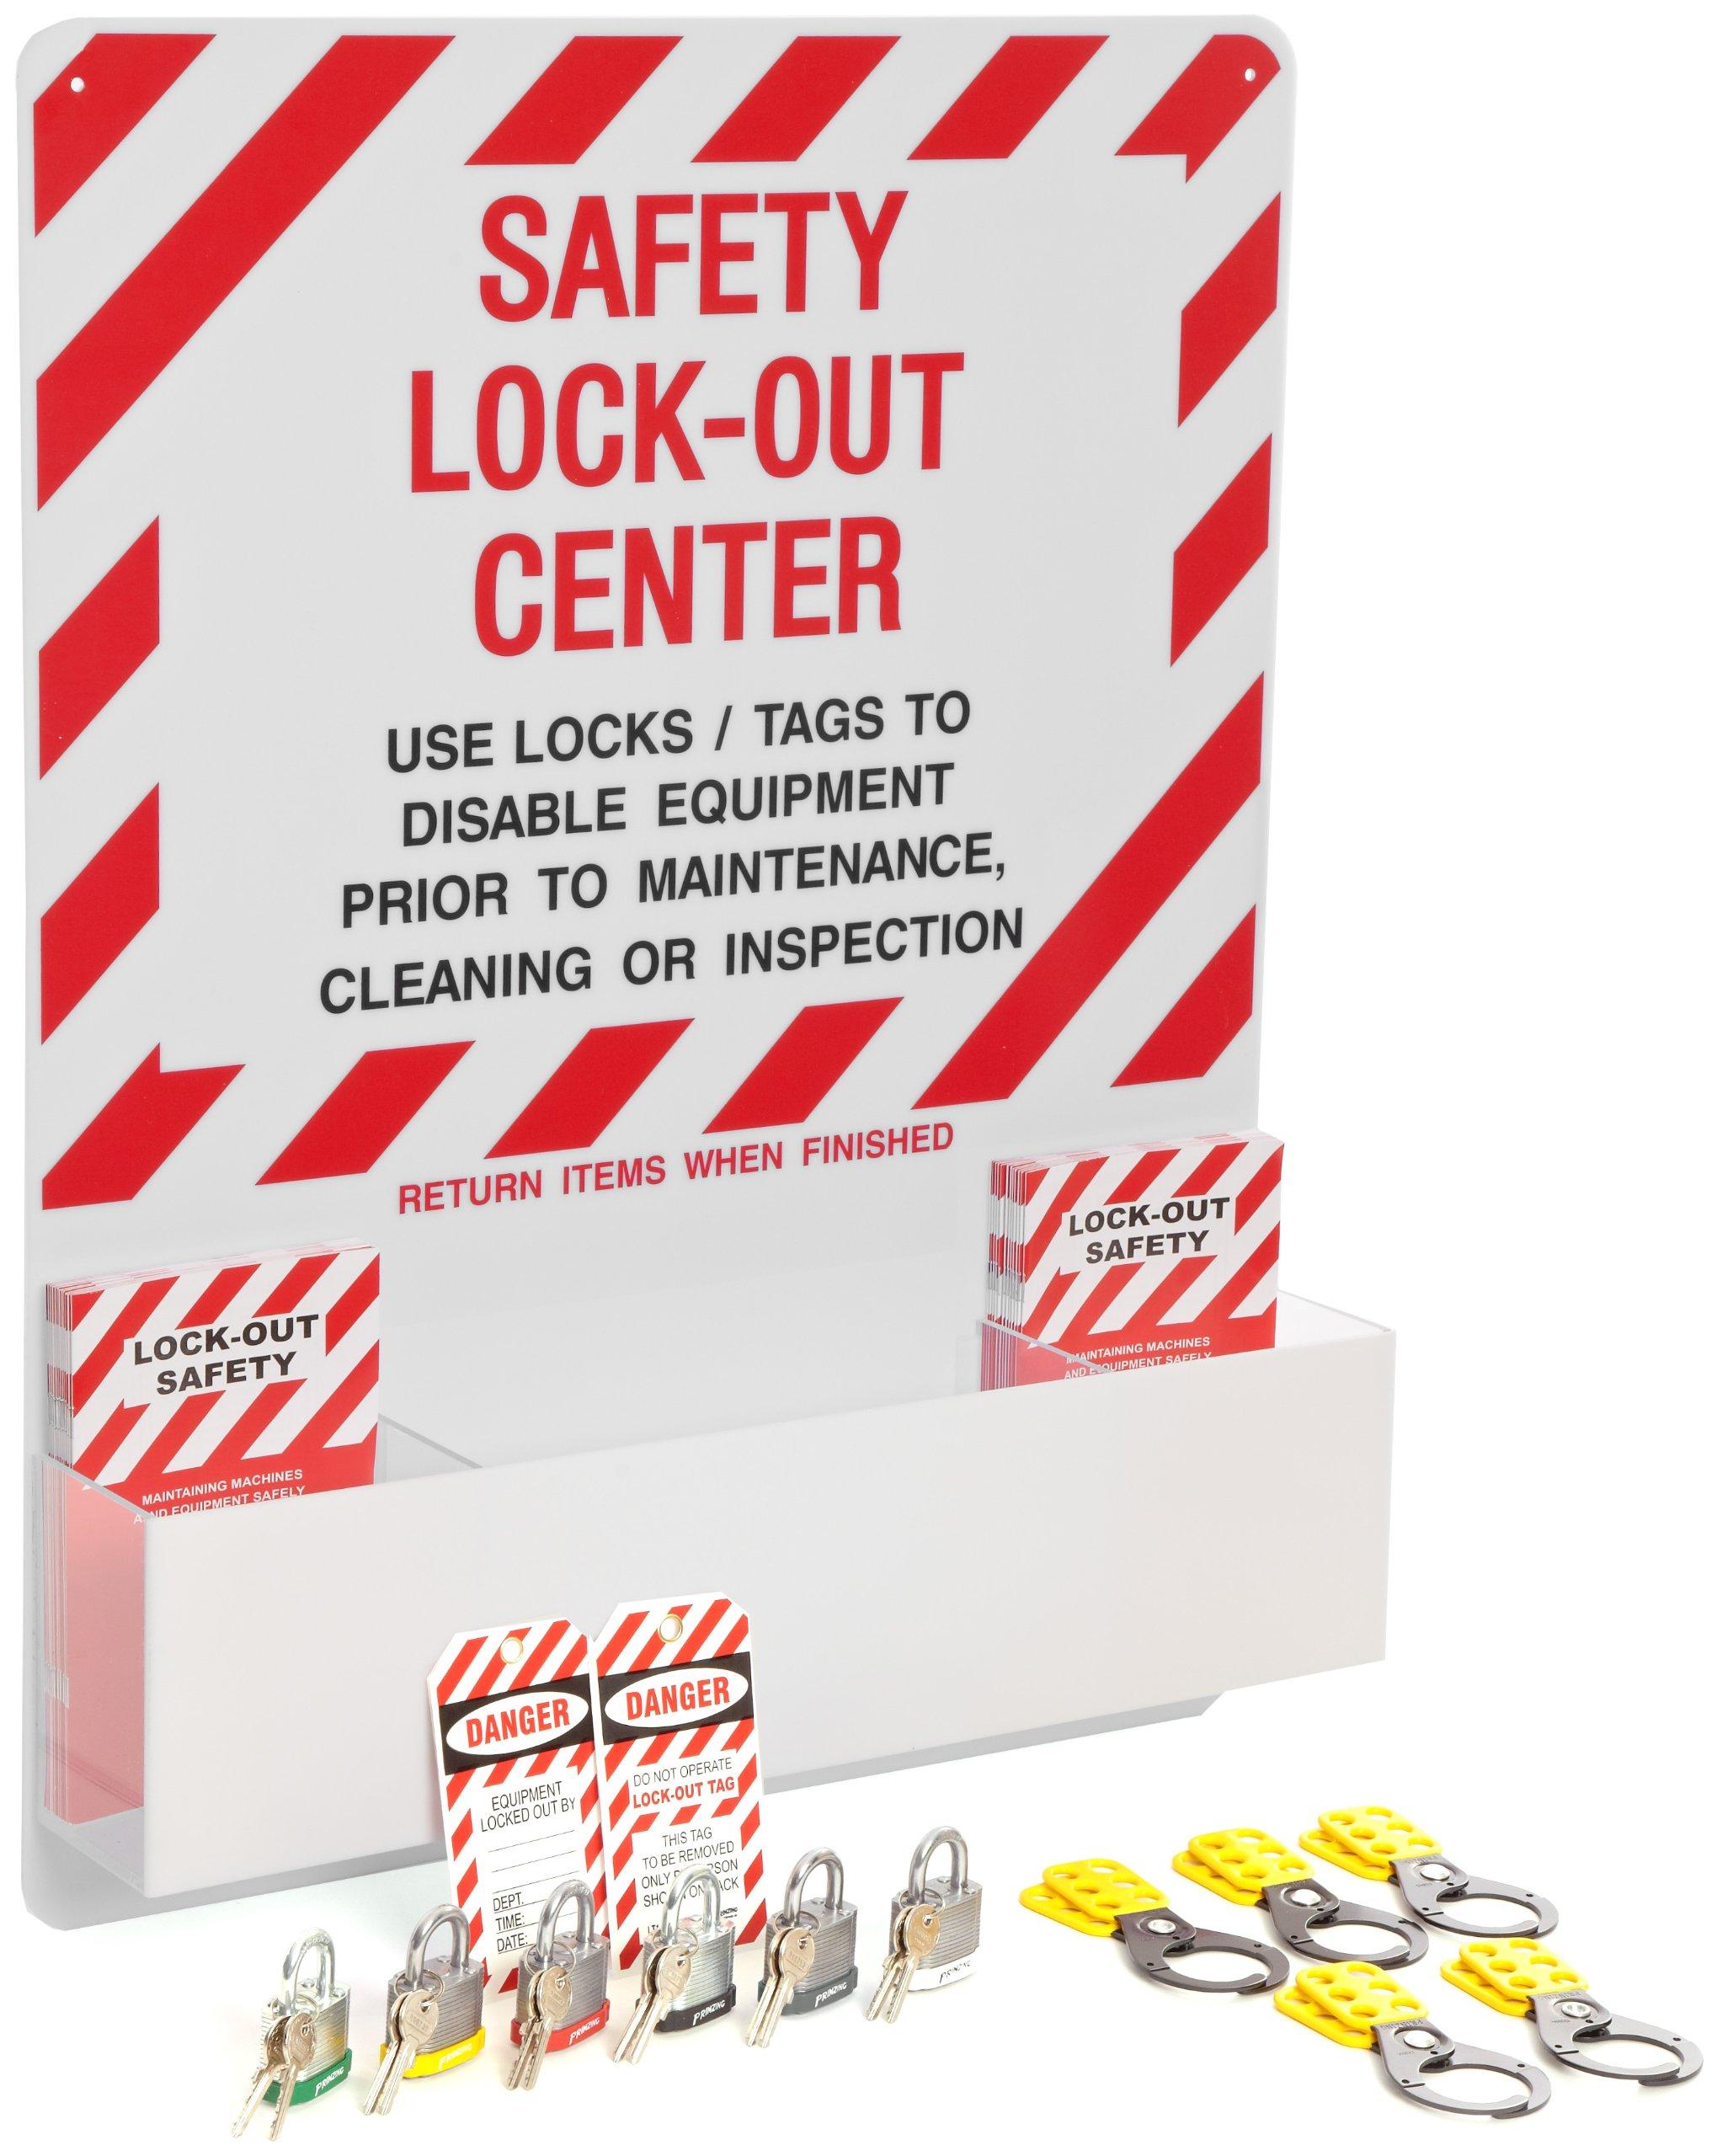 Brady Prinzing Lockout Center, Includes booklets, tags, locks, hasps